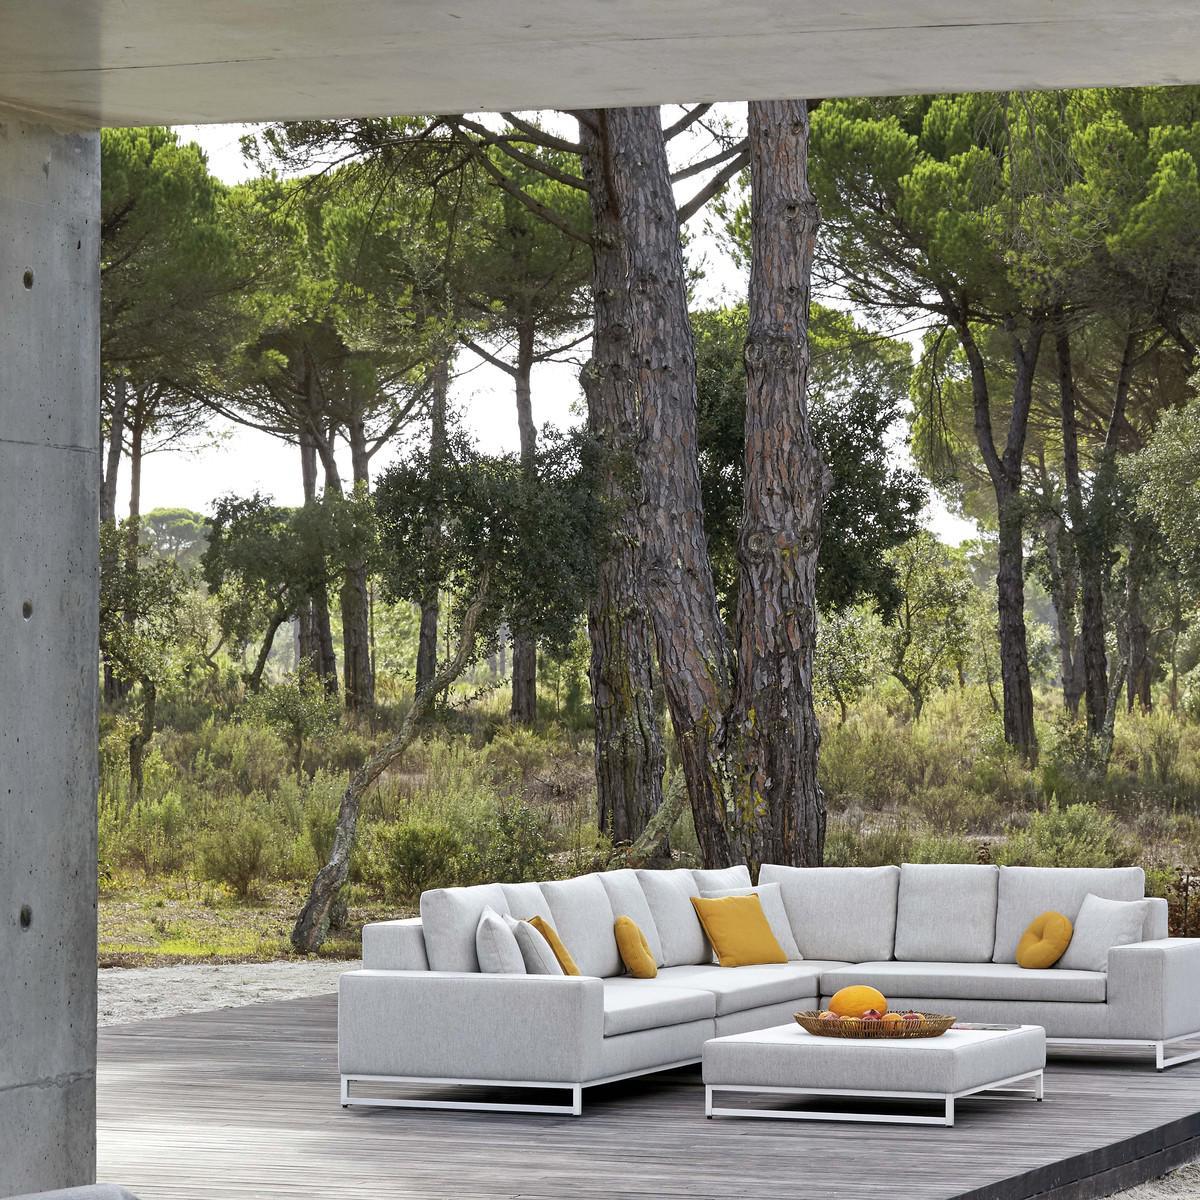 Zendo Lounge Chairs